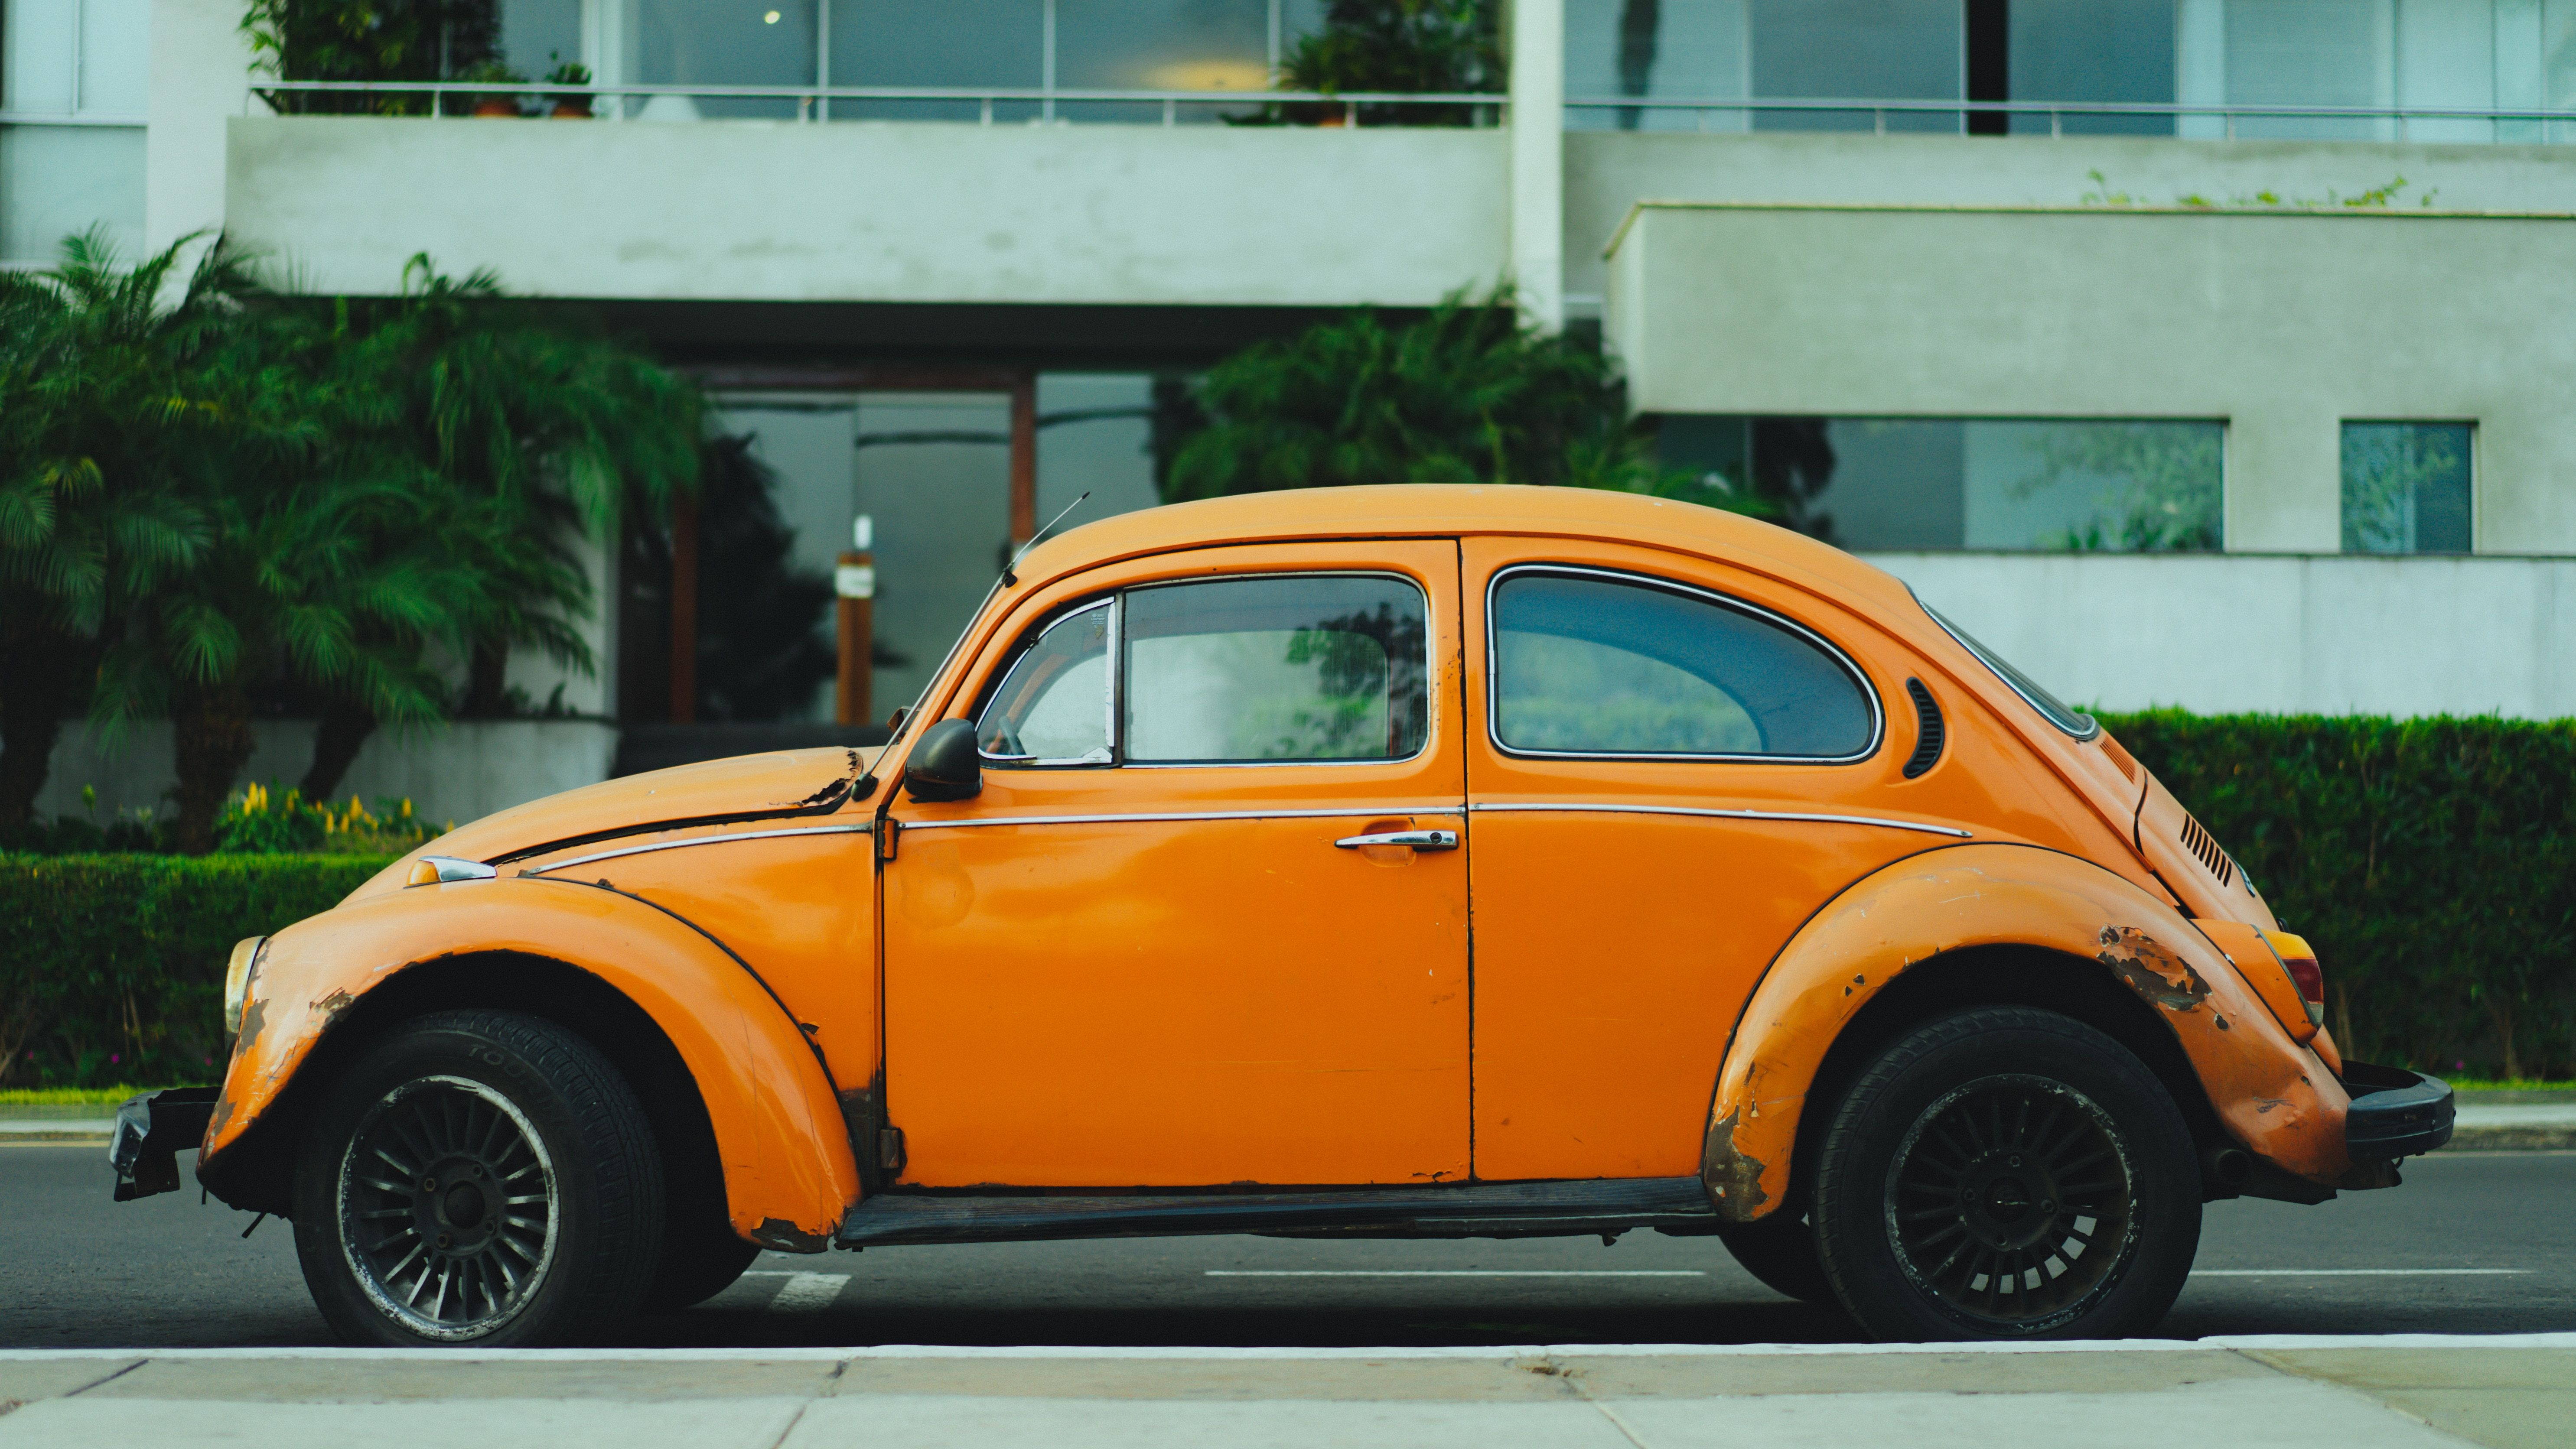 Car insurance tucson rightsure 5209175295 car buying